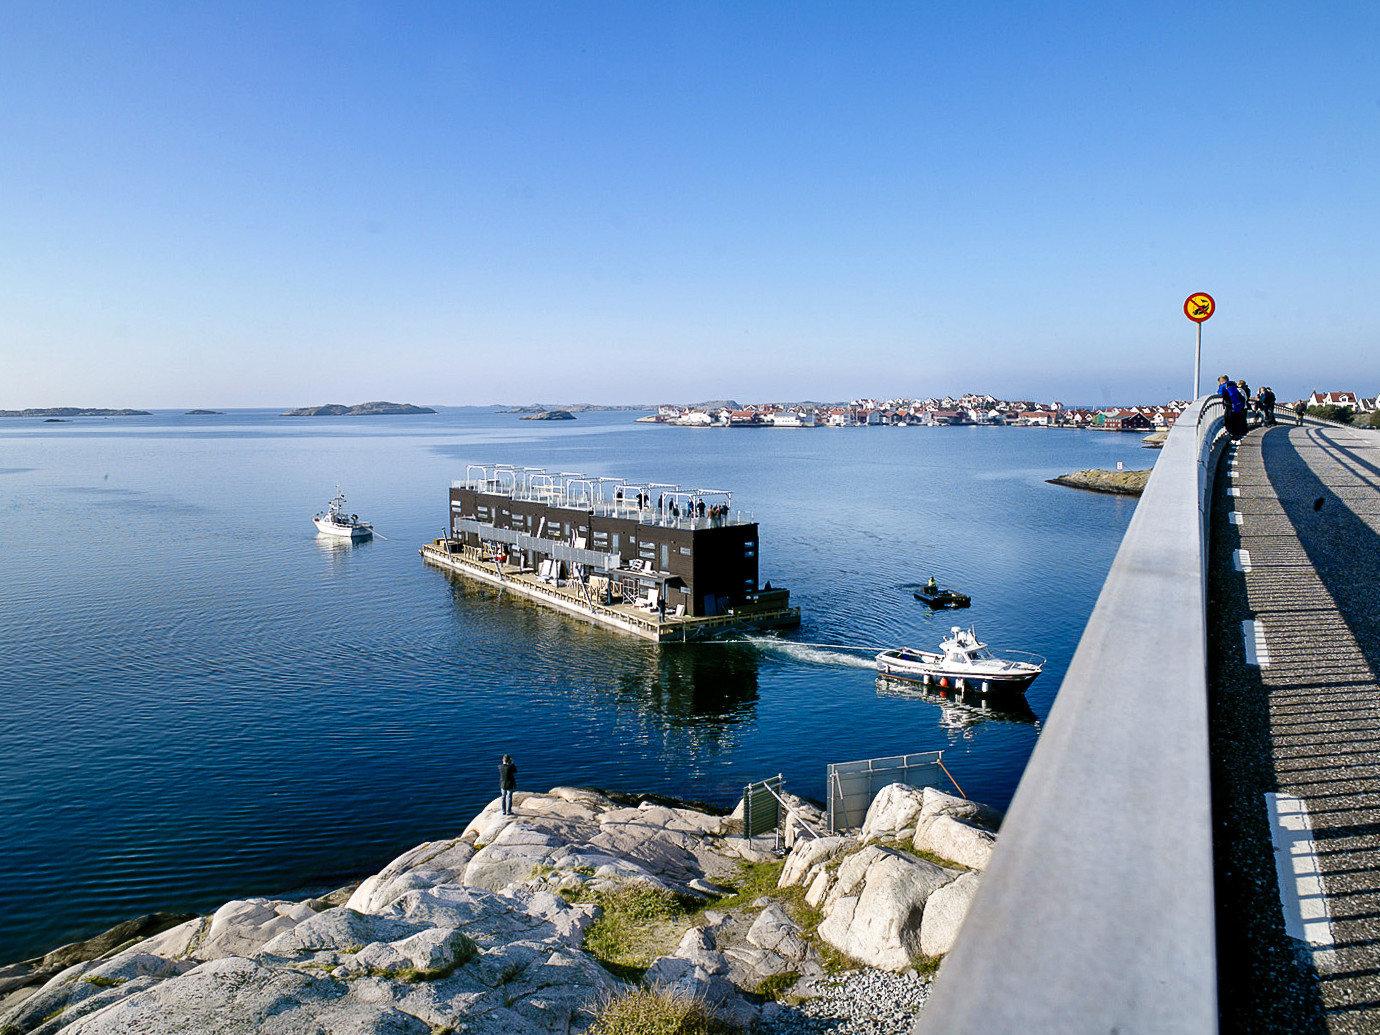 Boutique Hotels Sweden Sea water waterway sky breakwater Coast horizon fixed link coastal and oceanic landforms port Ocean calm dock channel